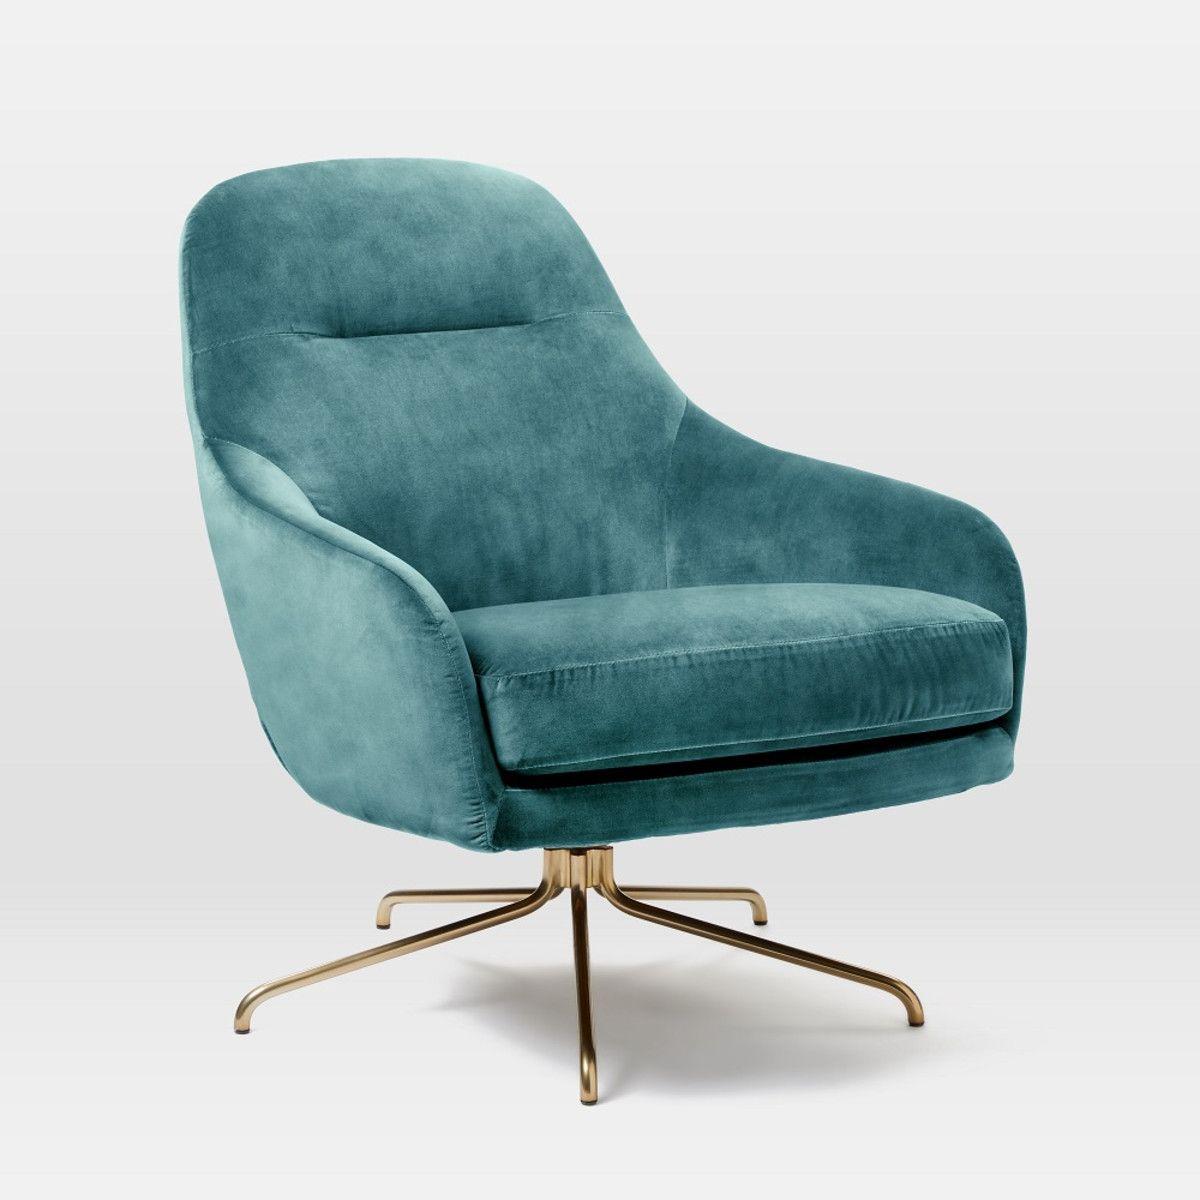 Admirable Valentina Swivel Chair In 2019 Interiors Chair Swivel Ibusinesslaw Wood Chair Design Ideas Ibusinesslaworg